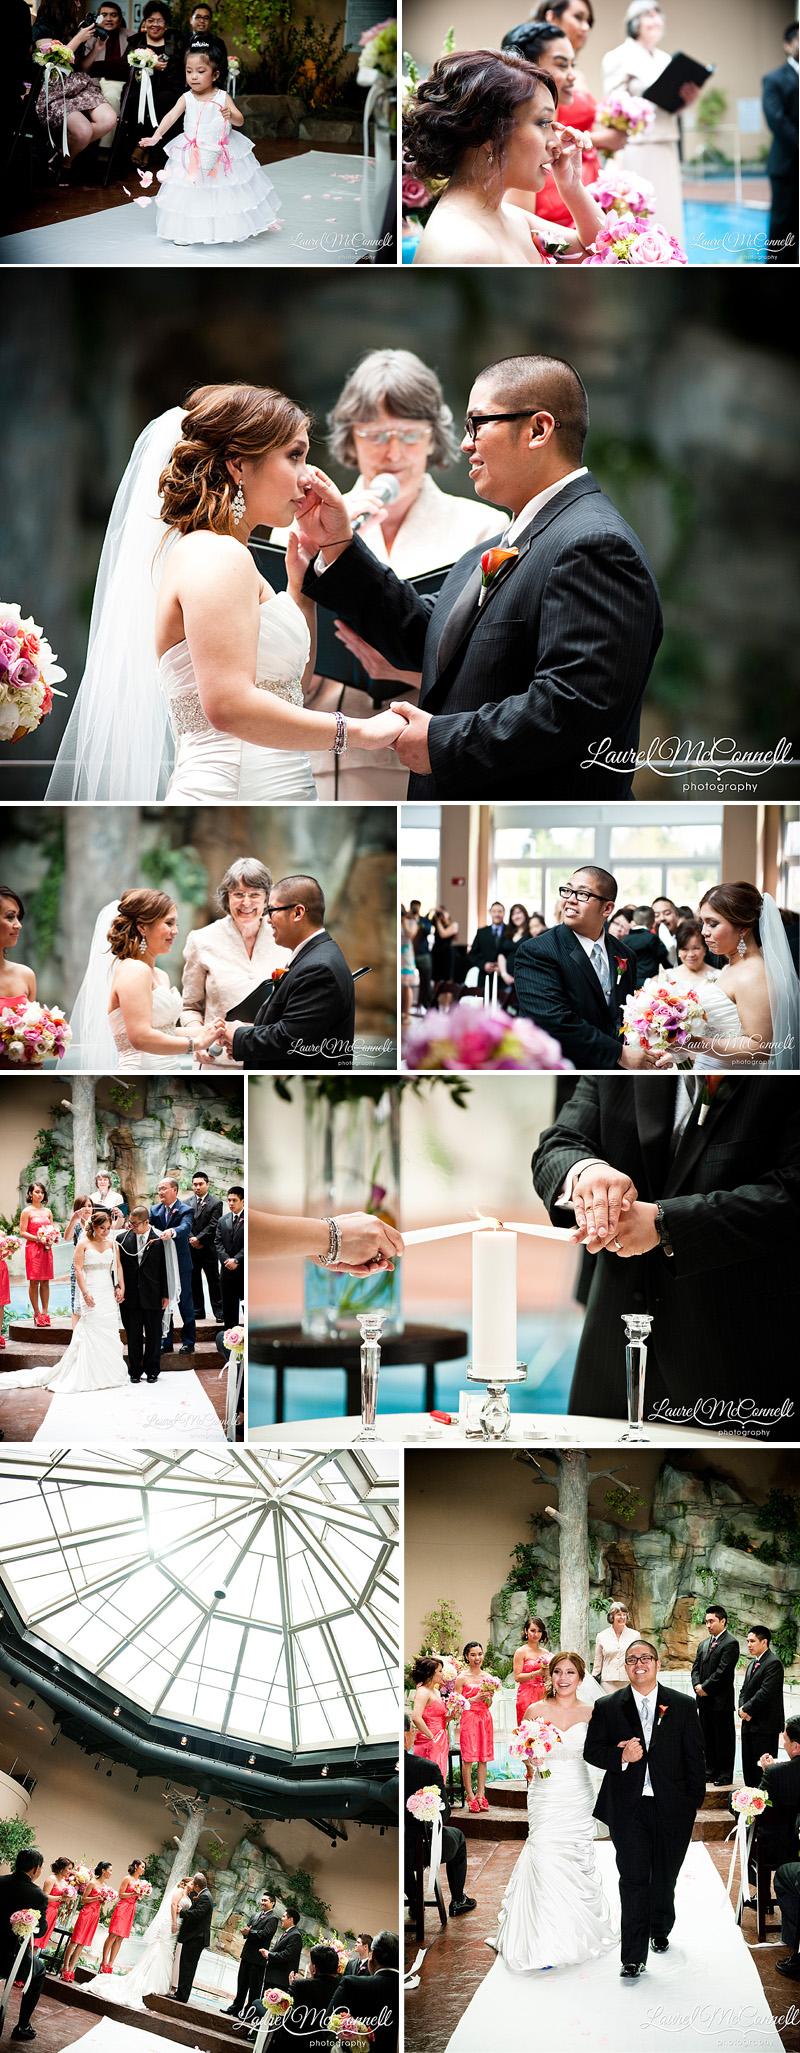 wedding photos of filipino ceremony at the tulalip casino